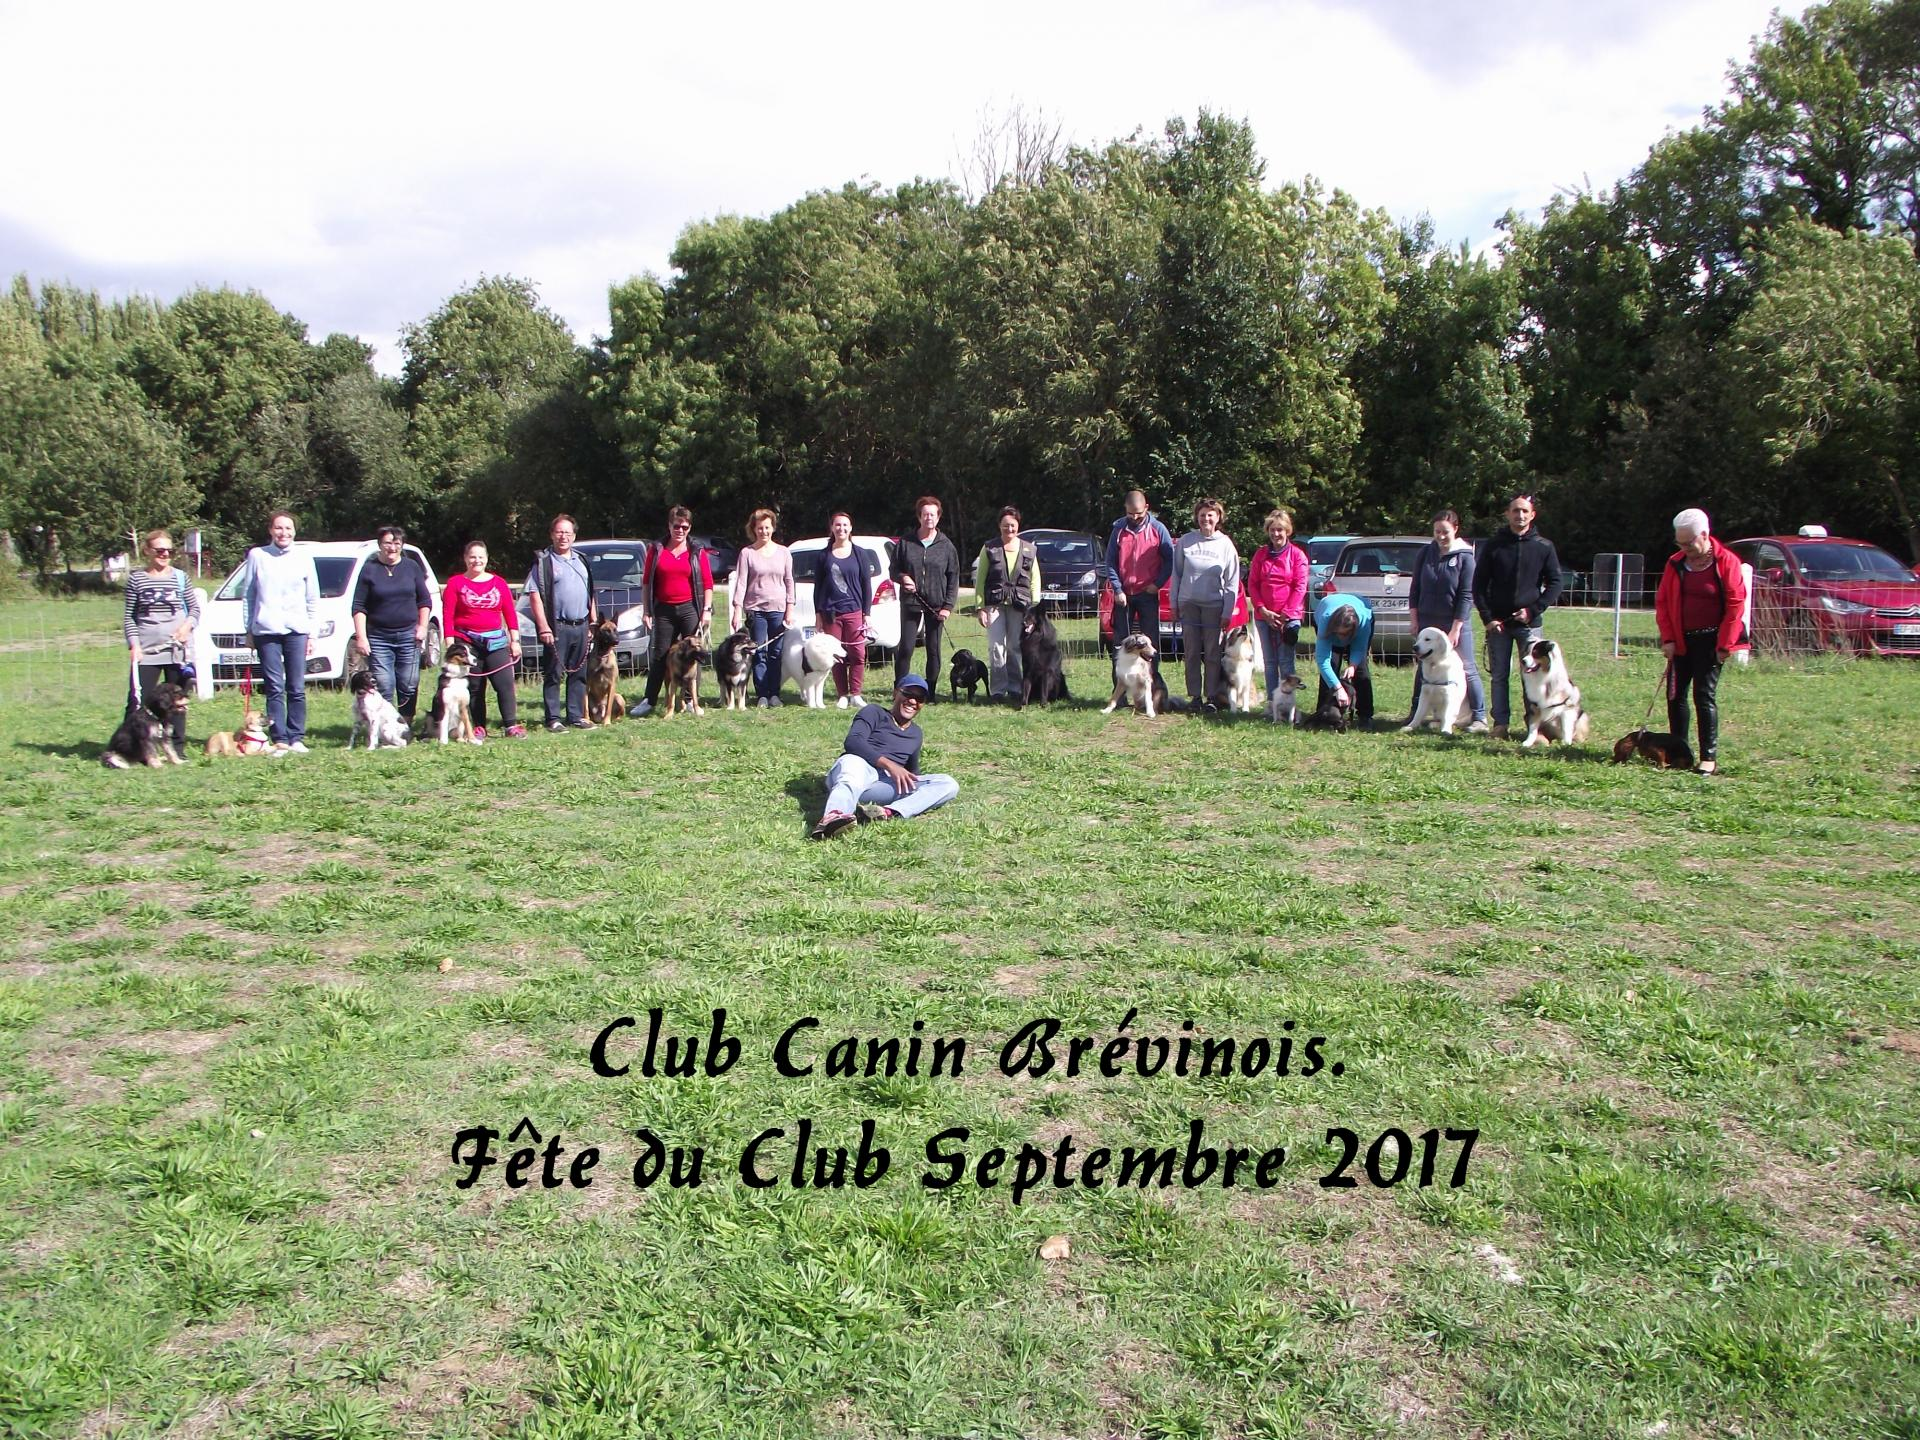 Club canin brevinois fete du club septembre 2017